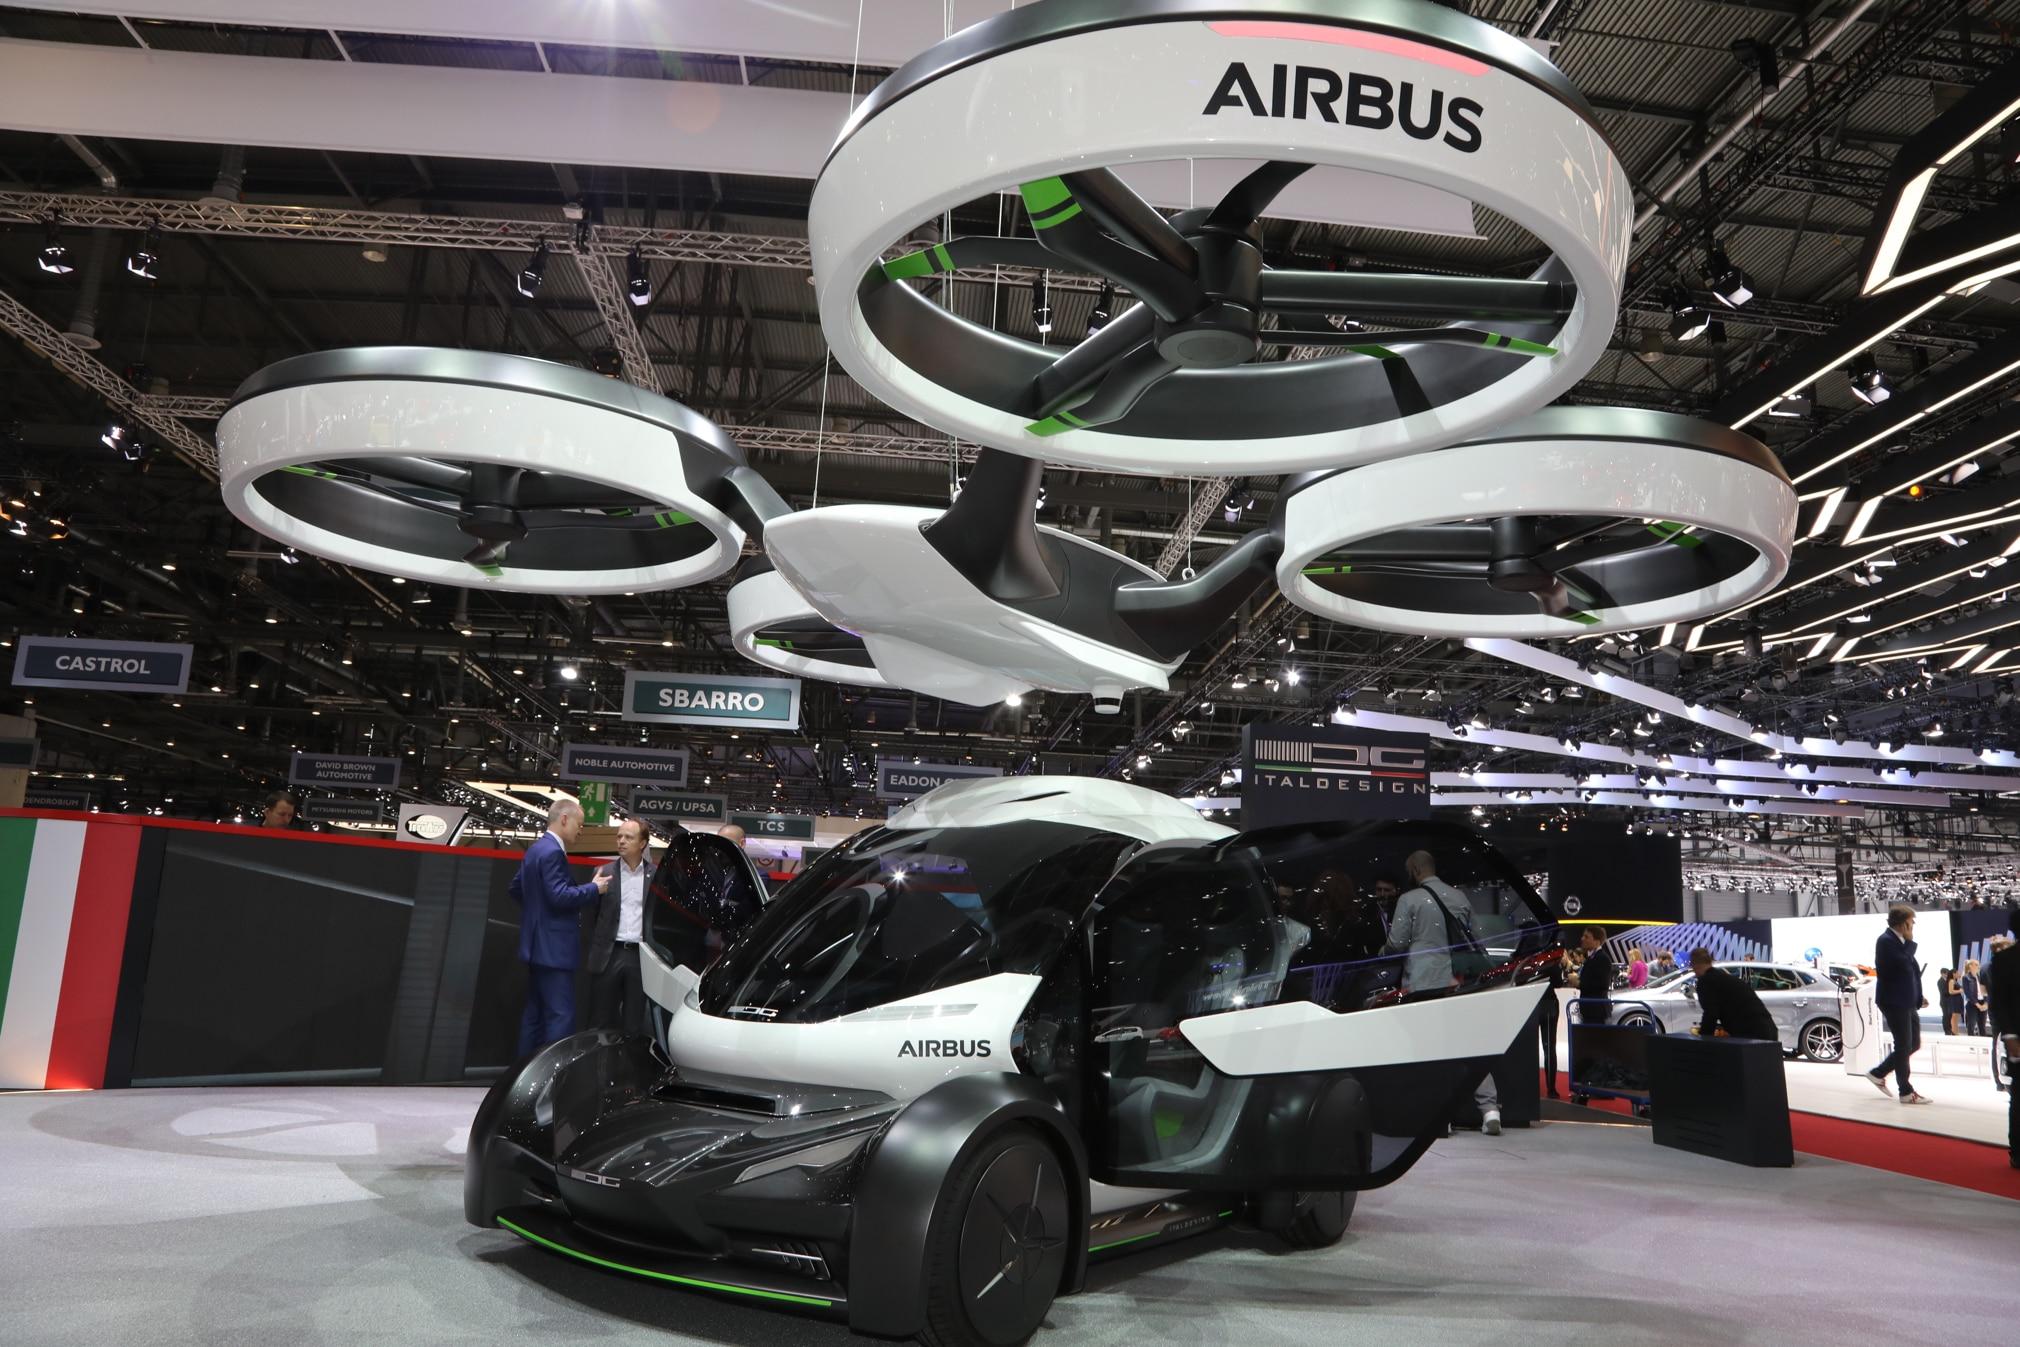 We Hear Italdesign Airbus Bringing Traffic Beating Car